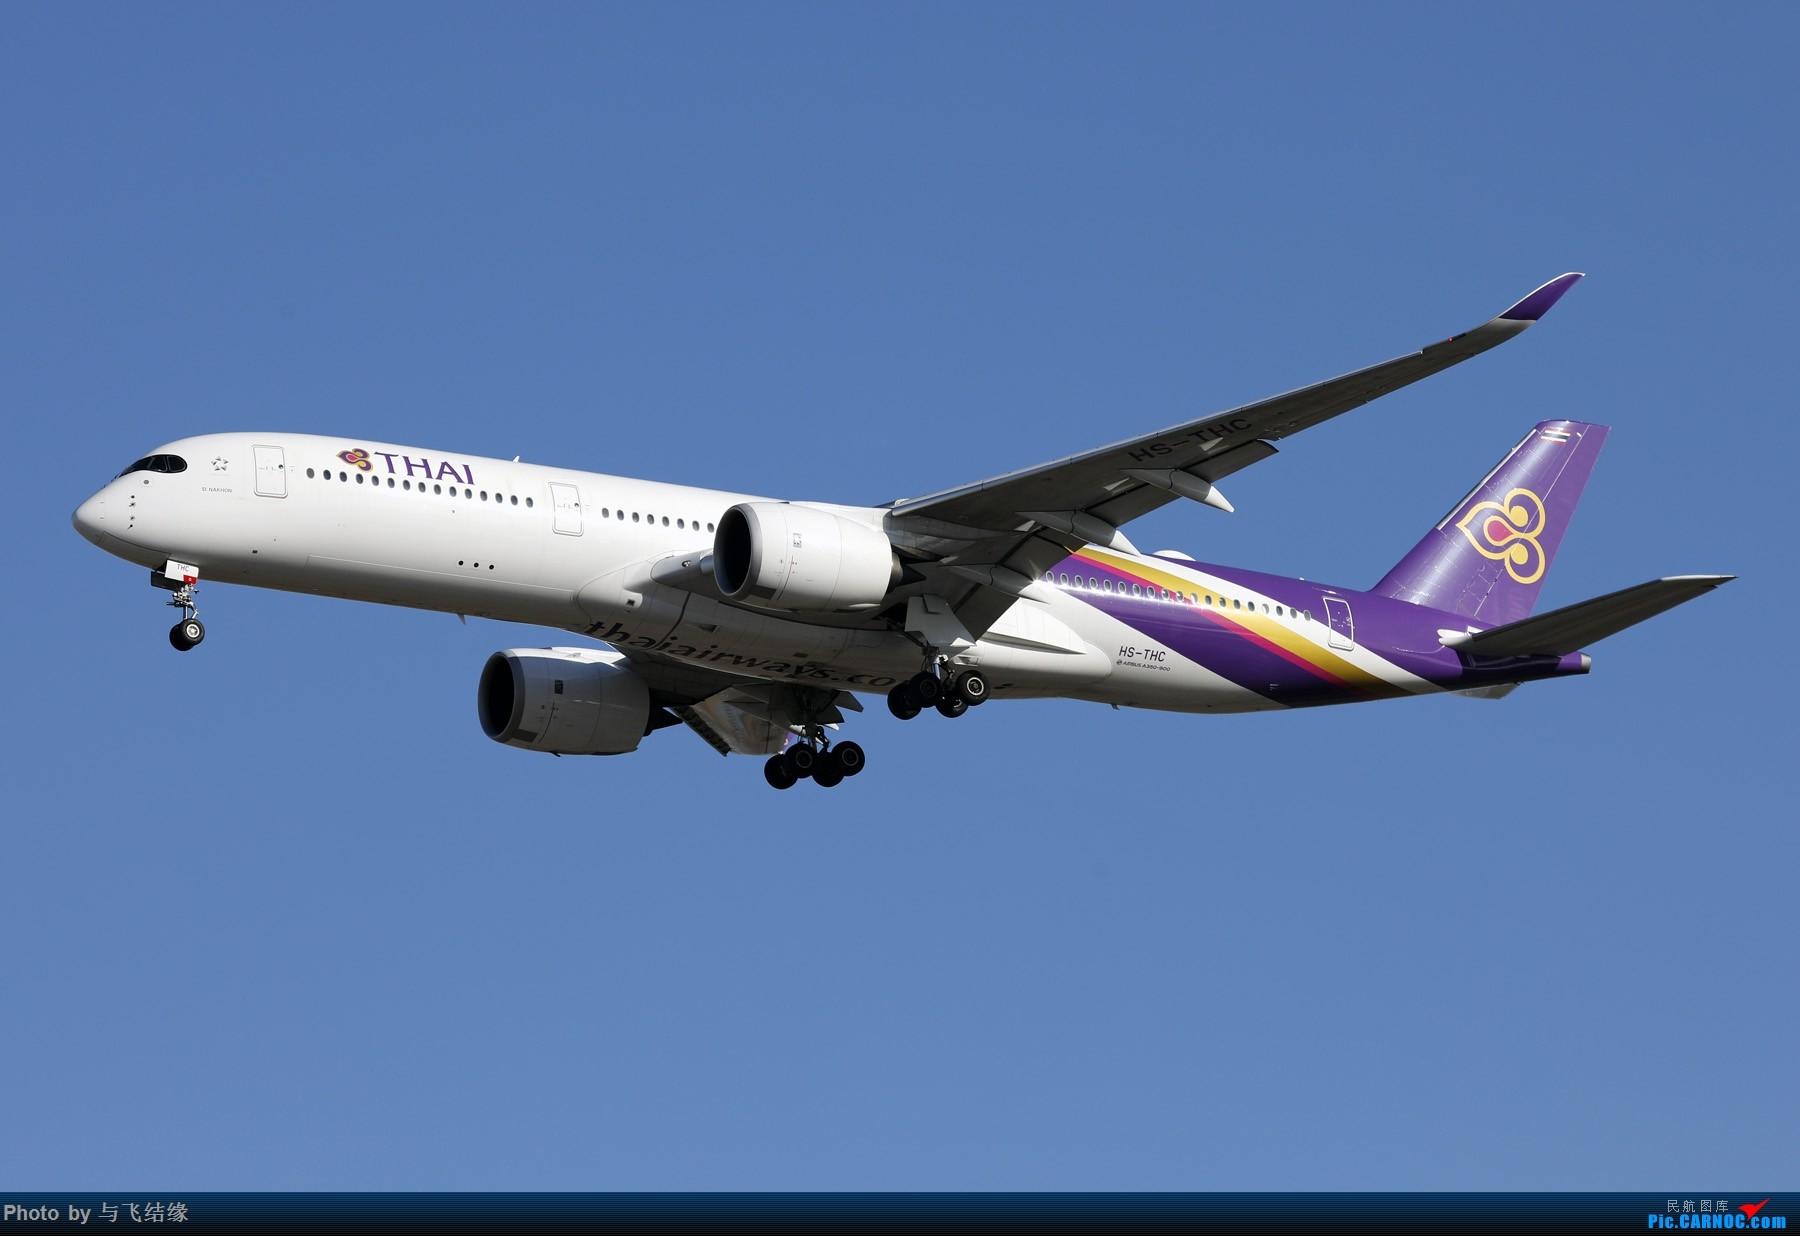 Re:[原创]以色列航空波音777-200、加拿大航空波音77W新装、国航最新空客350-900. AIRBUS A350-900 HS-THC 中国北京首都国际机场